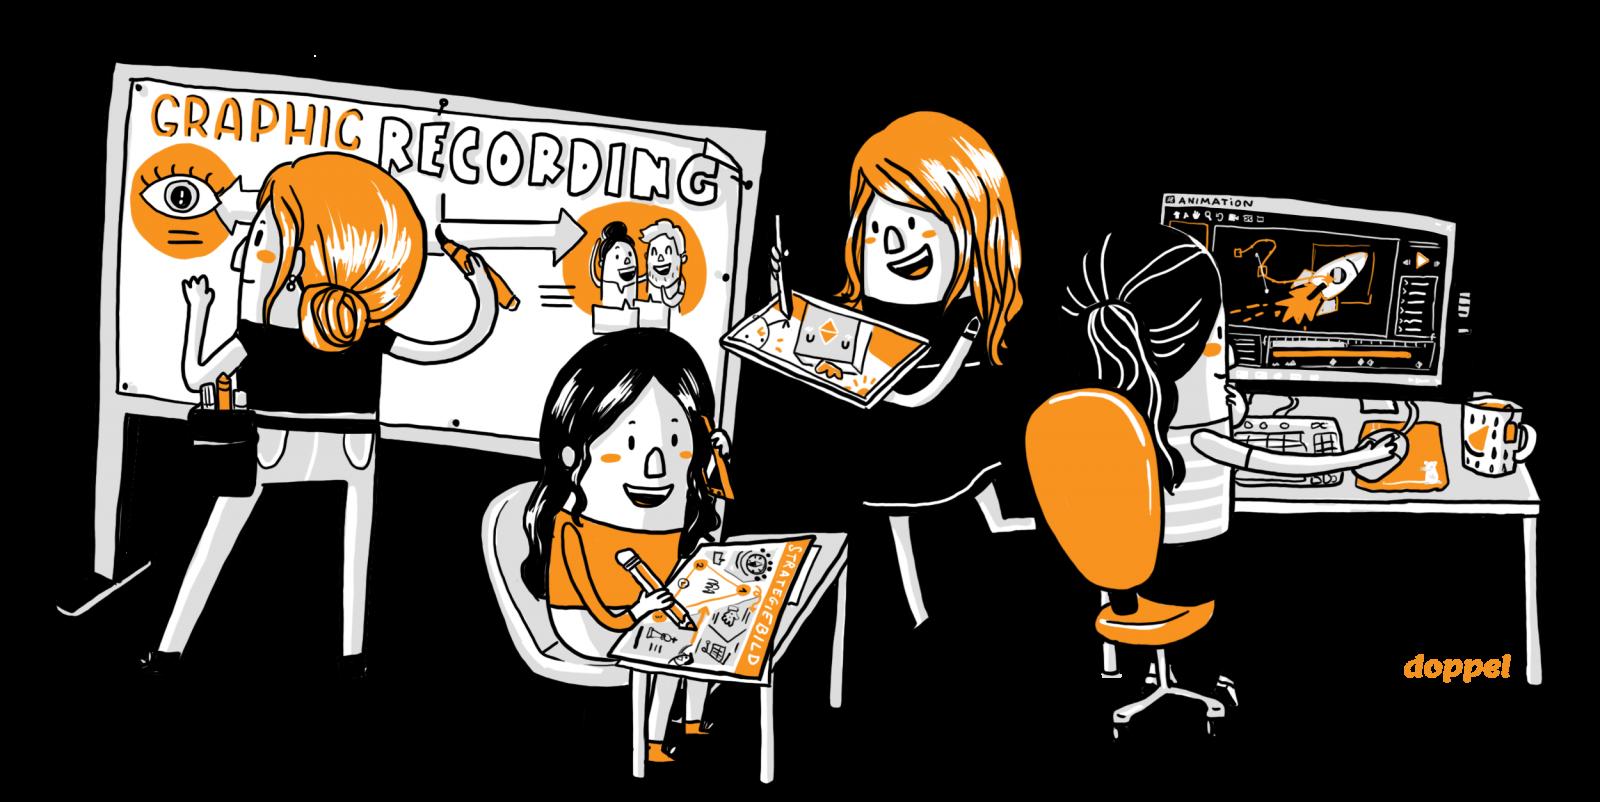 Designdoppel Graphic Recording Illustration und Animation